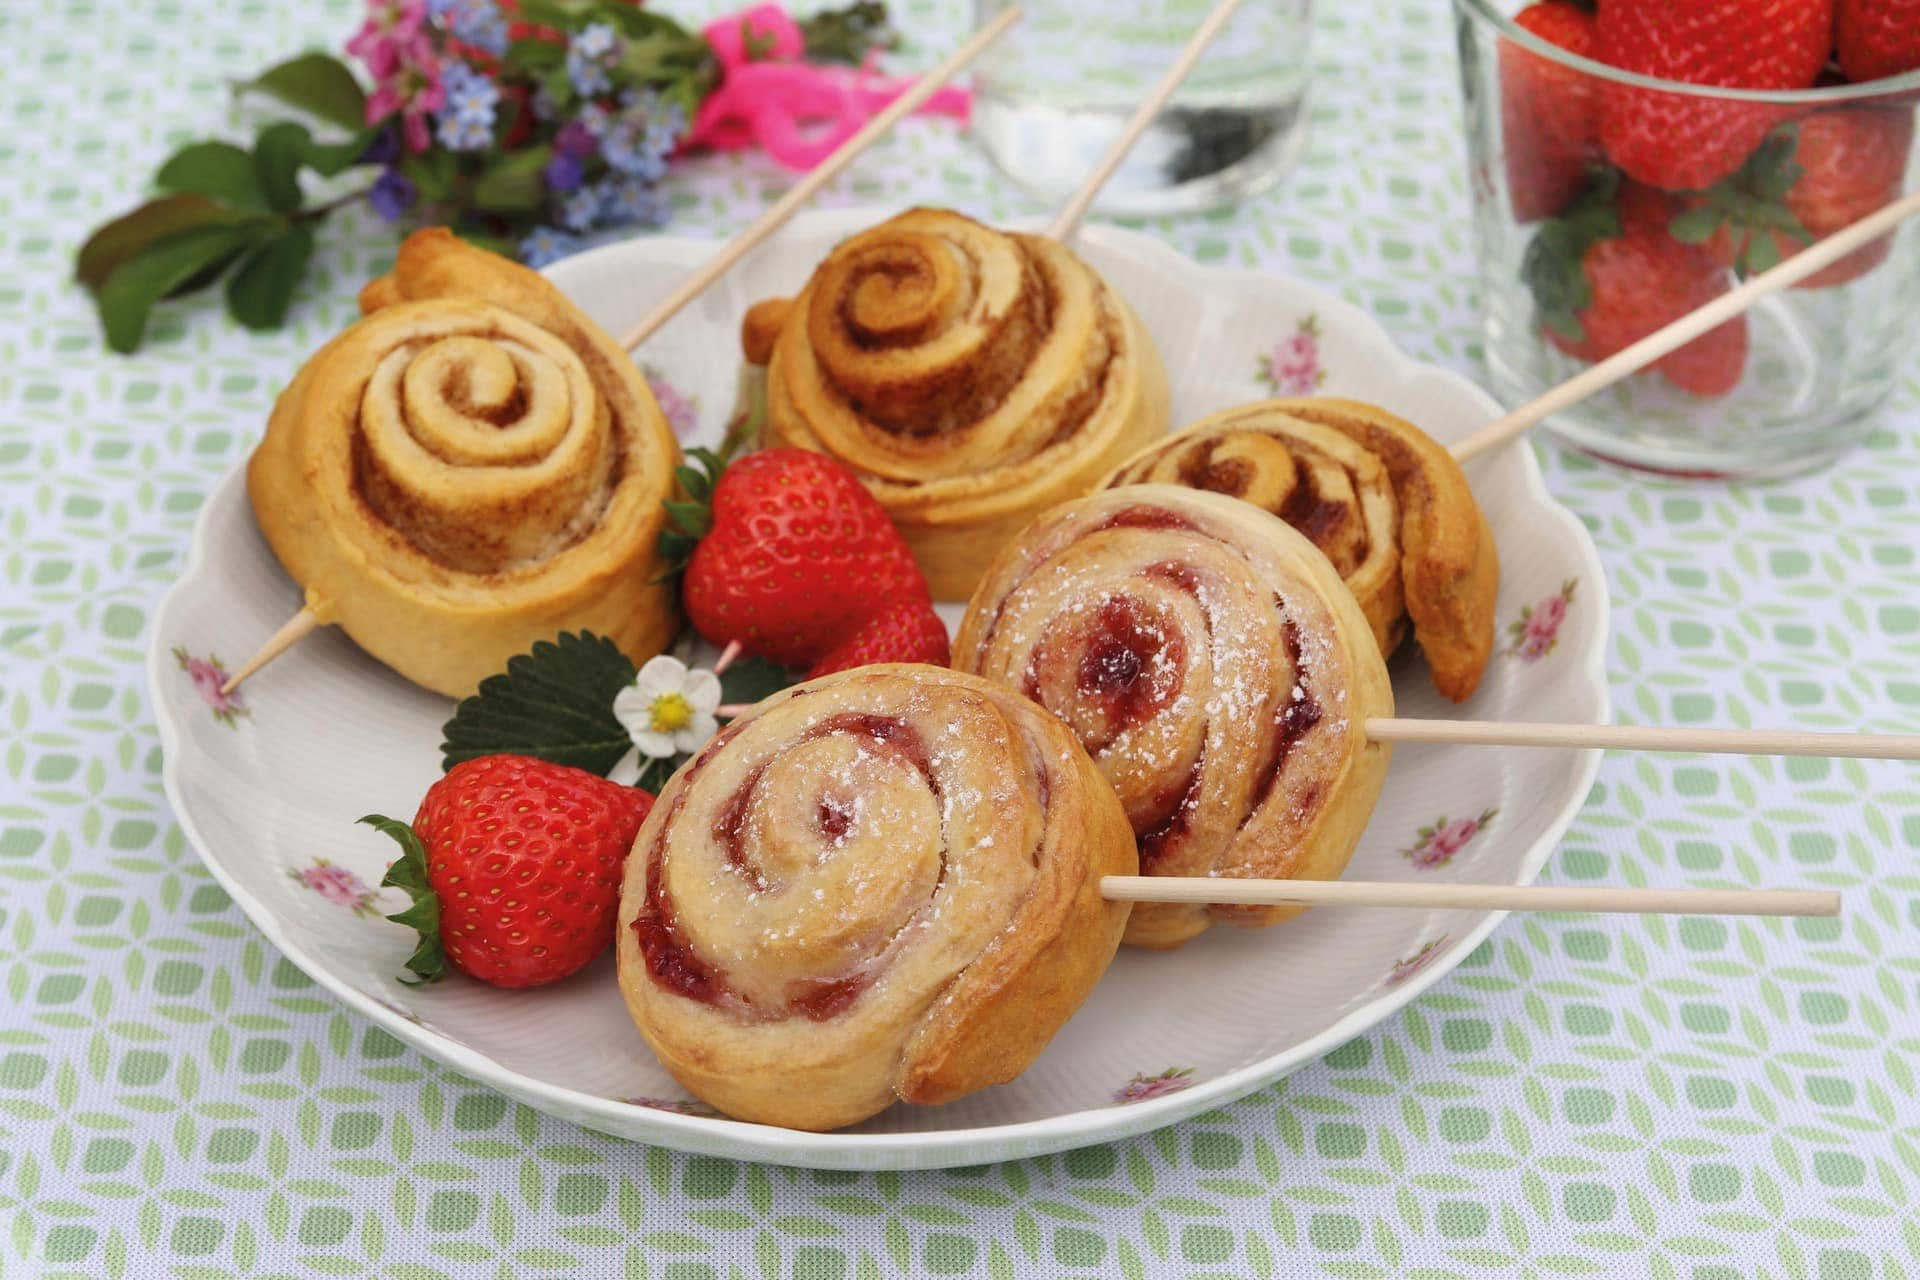 Backidee zum Muttertag Erdbeer-Frischkäse-Pops